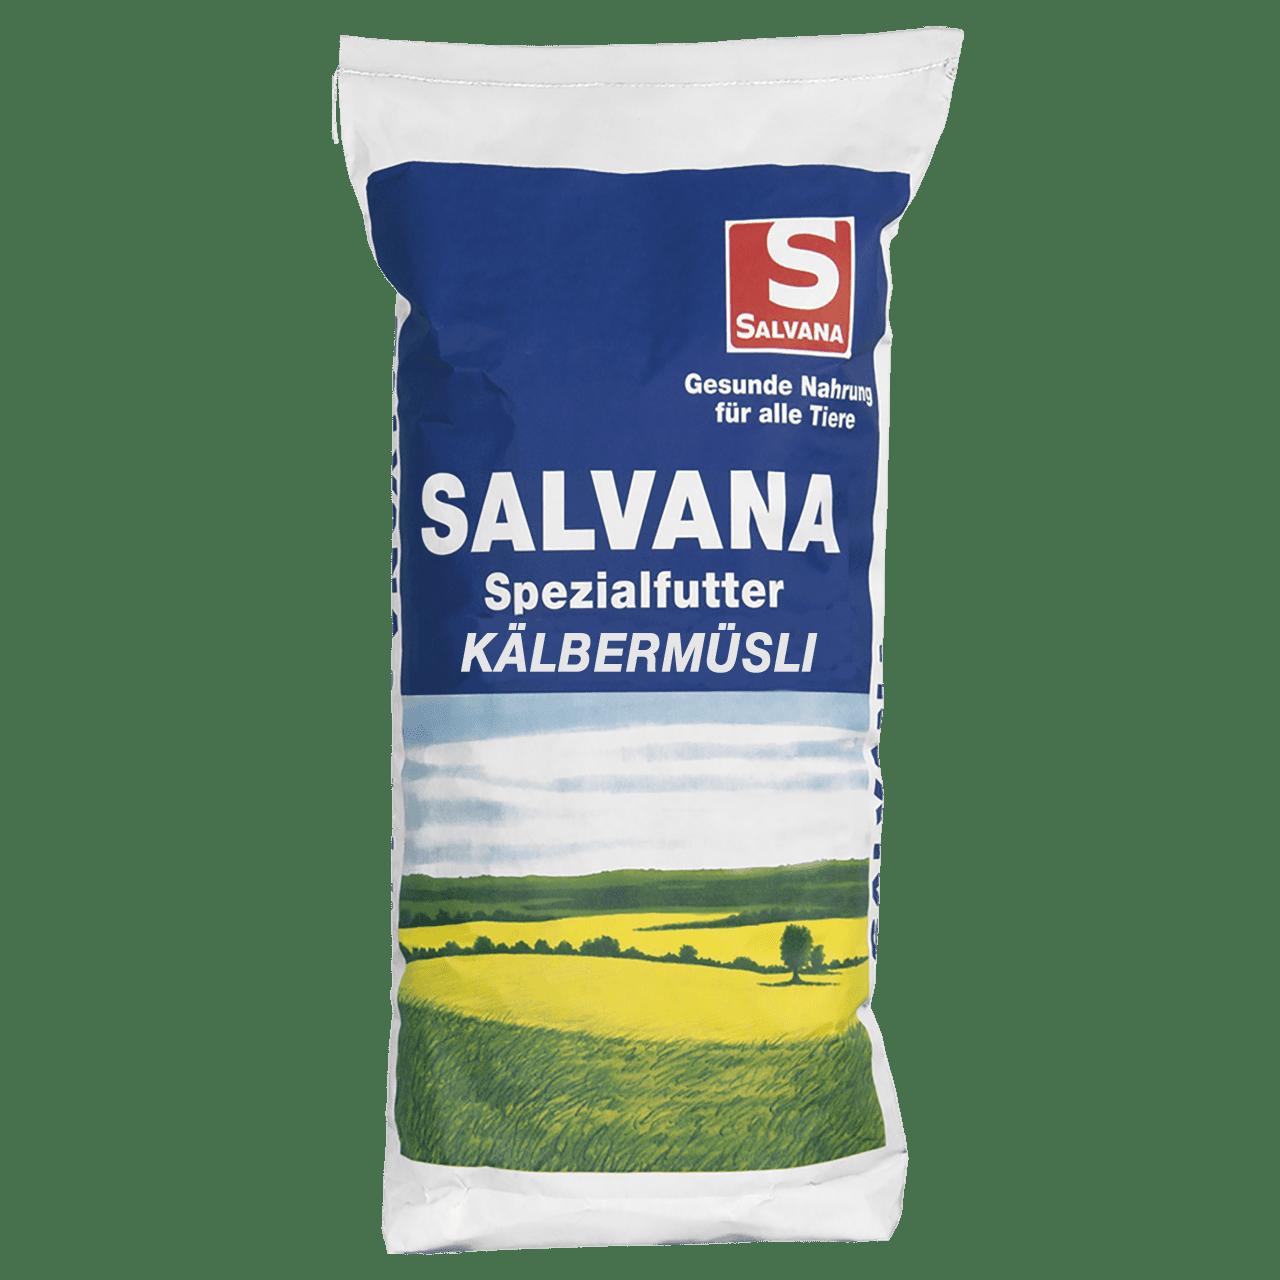 SALVANA KÄLBERMÜSLI